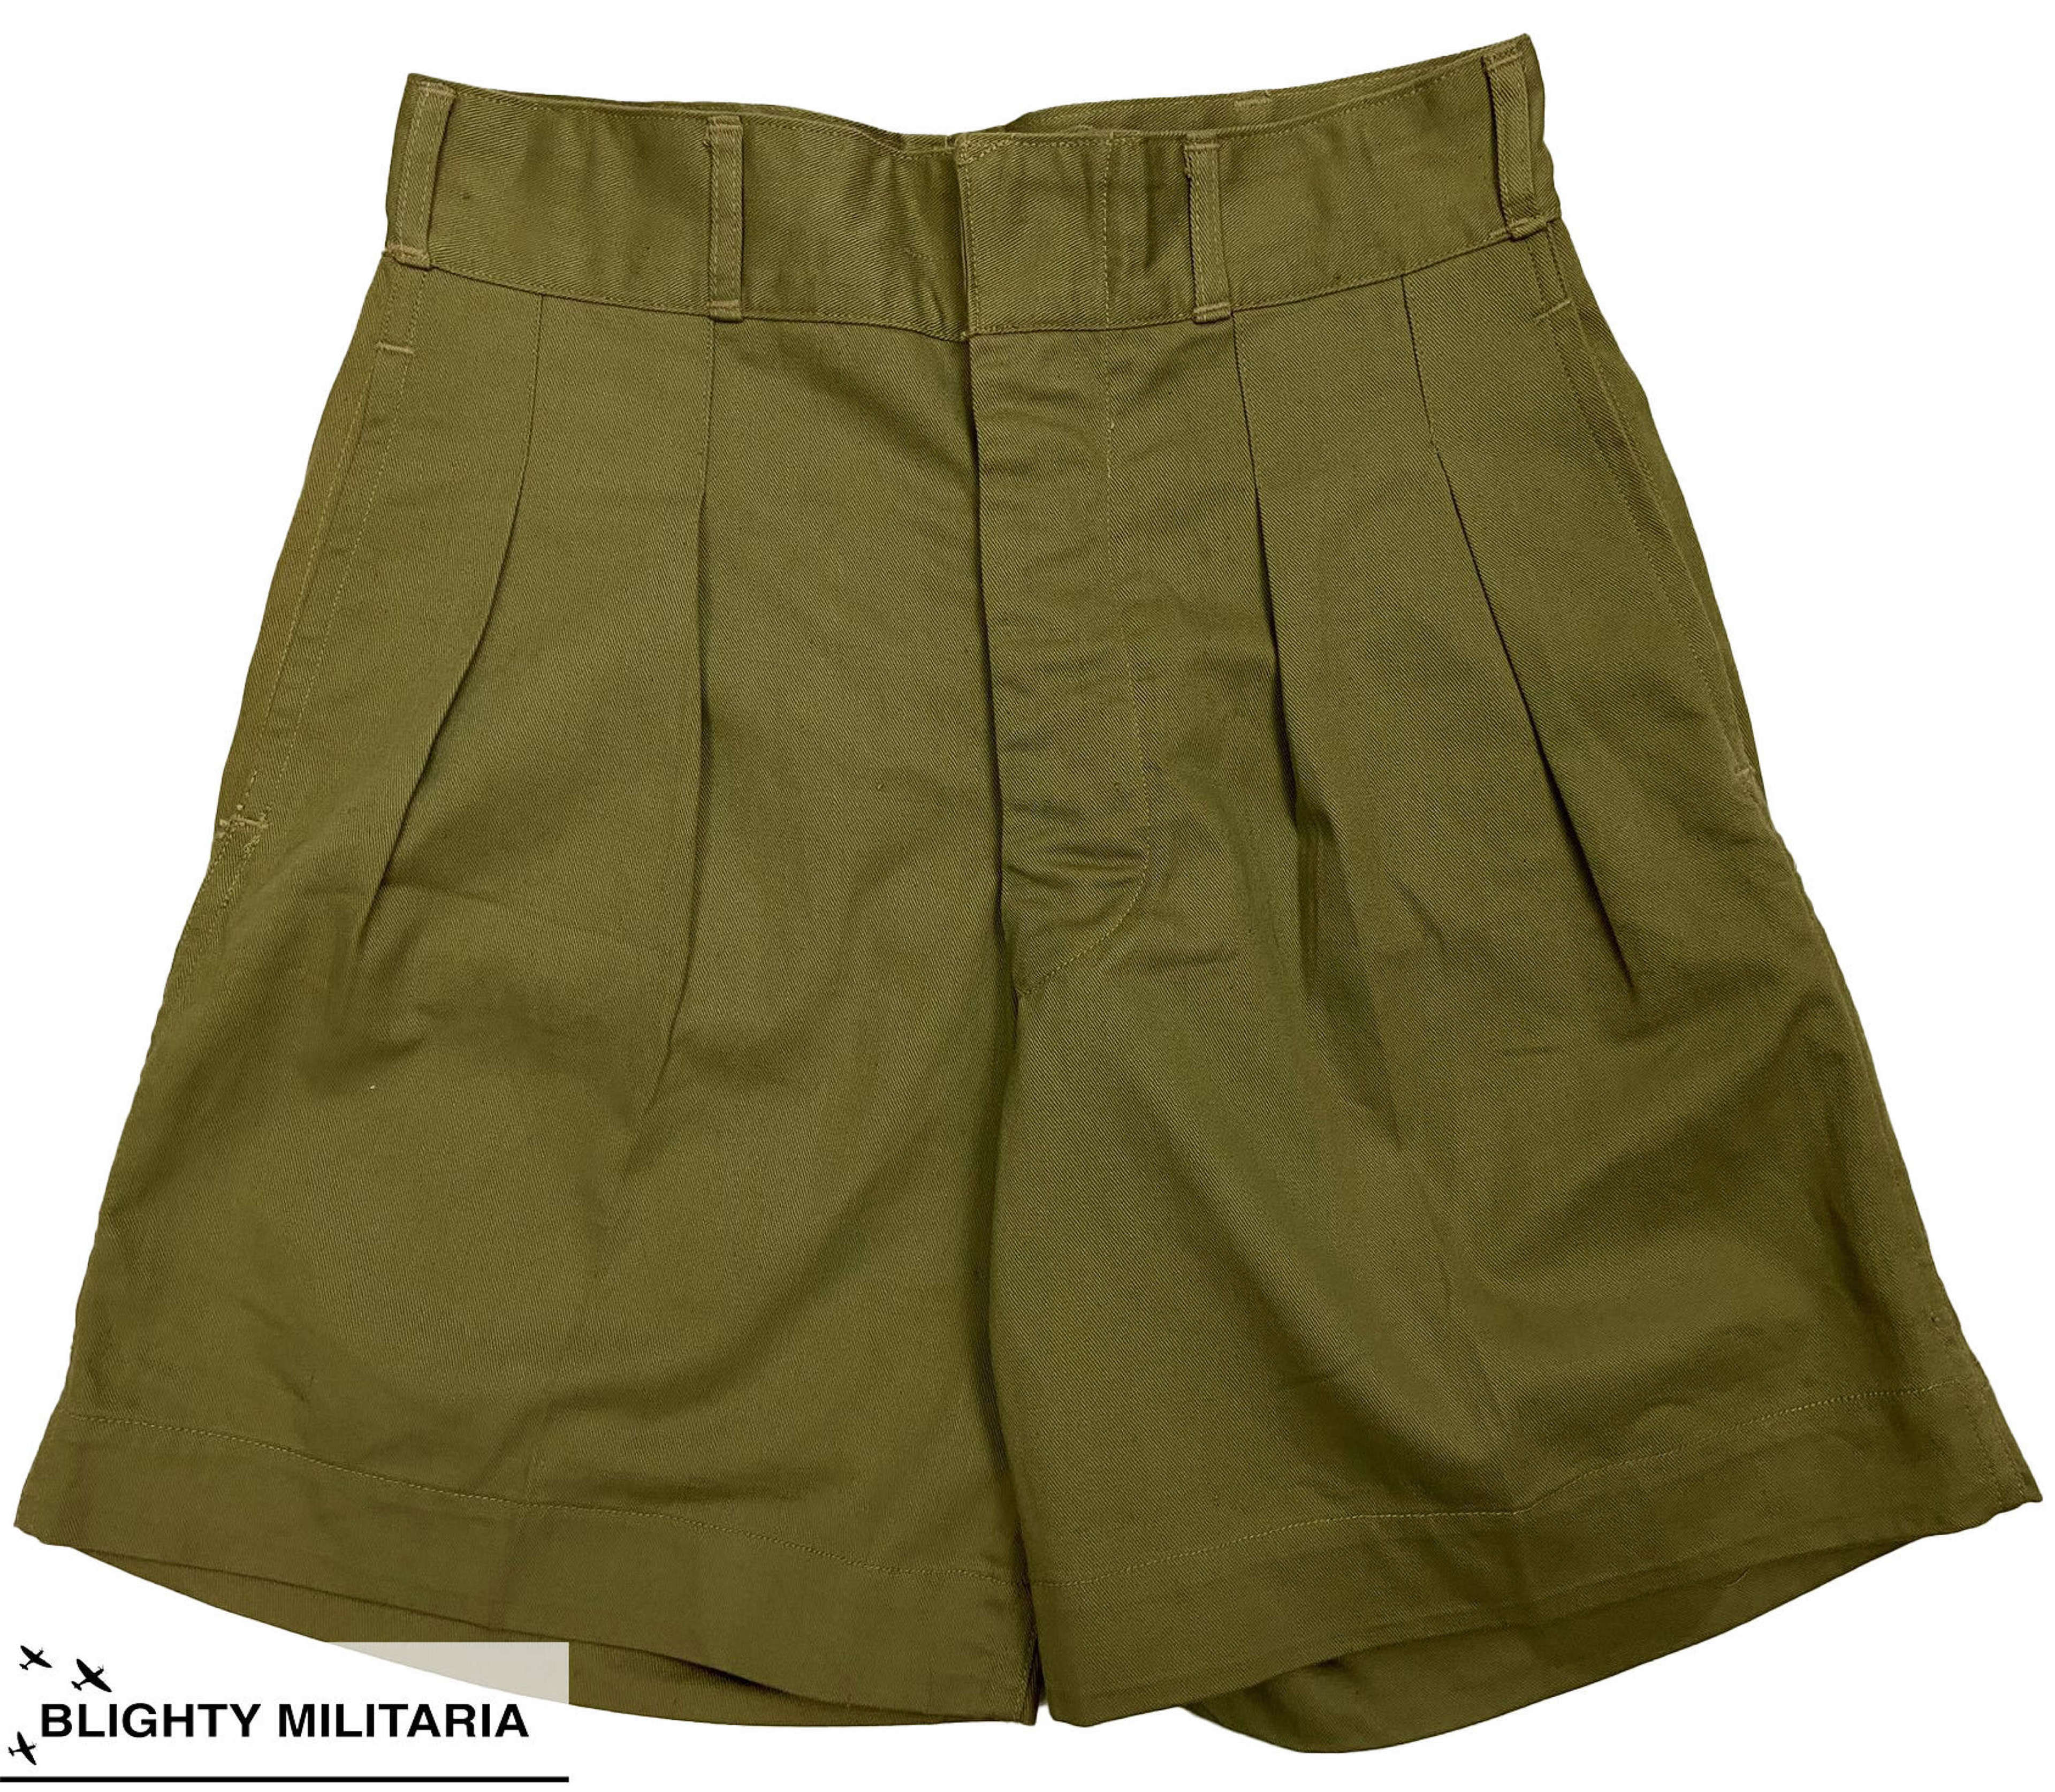 Original 1946 Dated Canadian Khaki Drill Shorts - Size 7